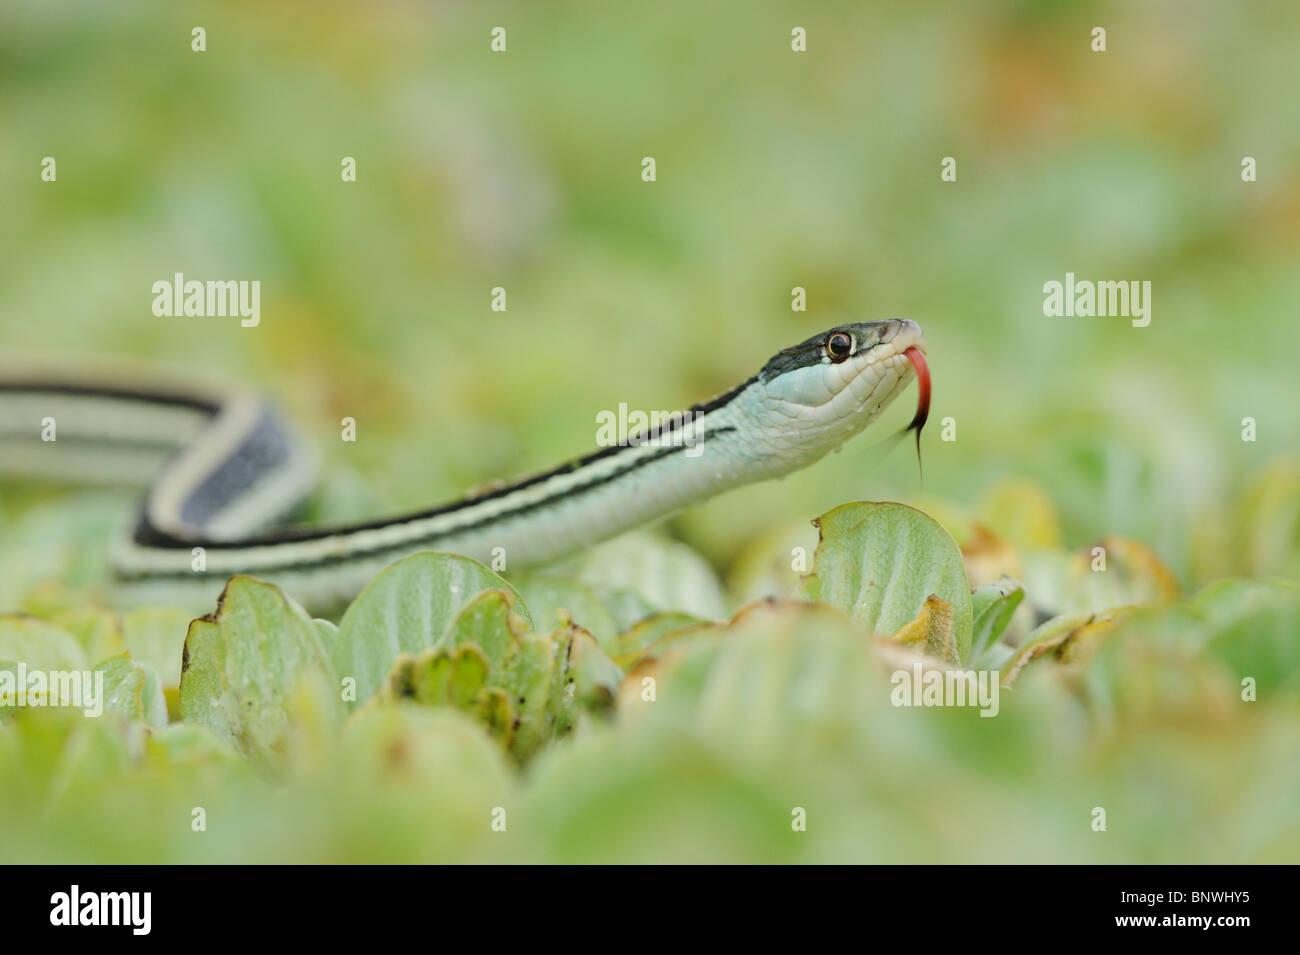 Gulf Coast Ribbon Snake (Thamnophis proximus orarius), adult on water lettuce, Corpus Christi, Coastal Bend, Texas - Stock Image